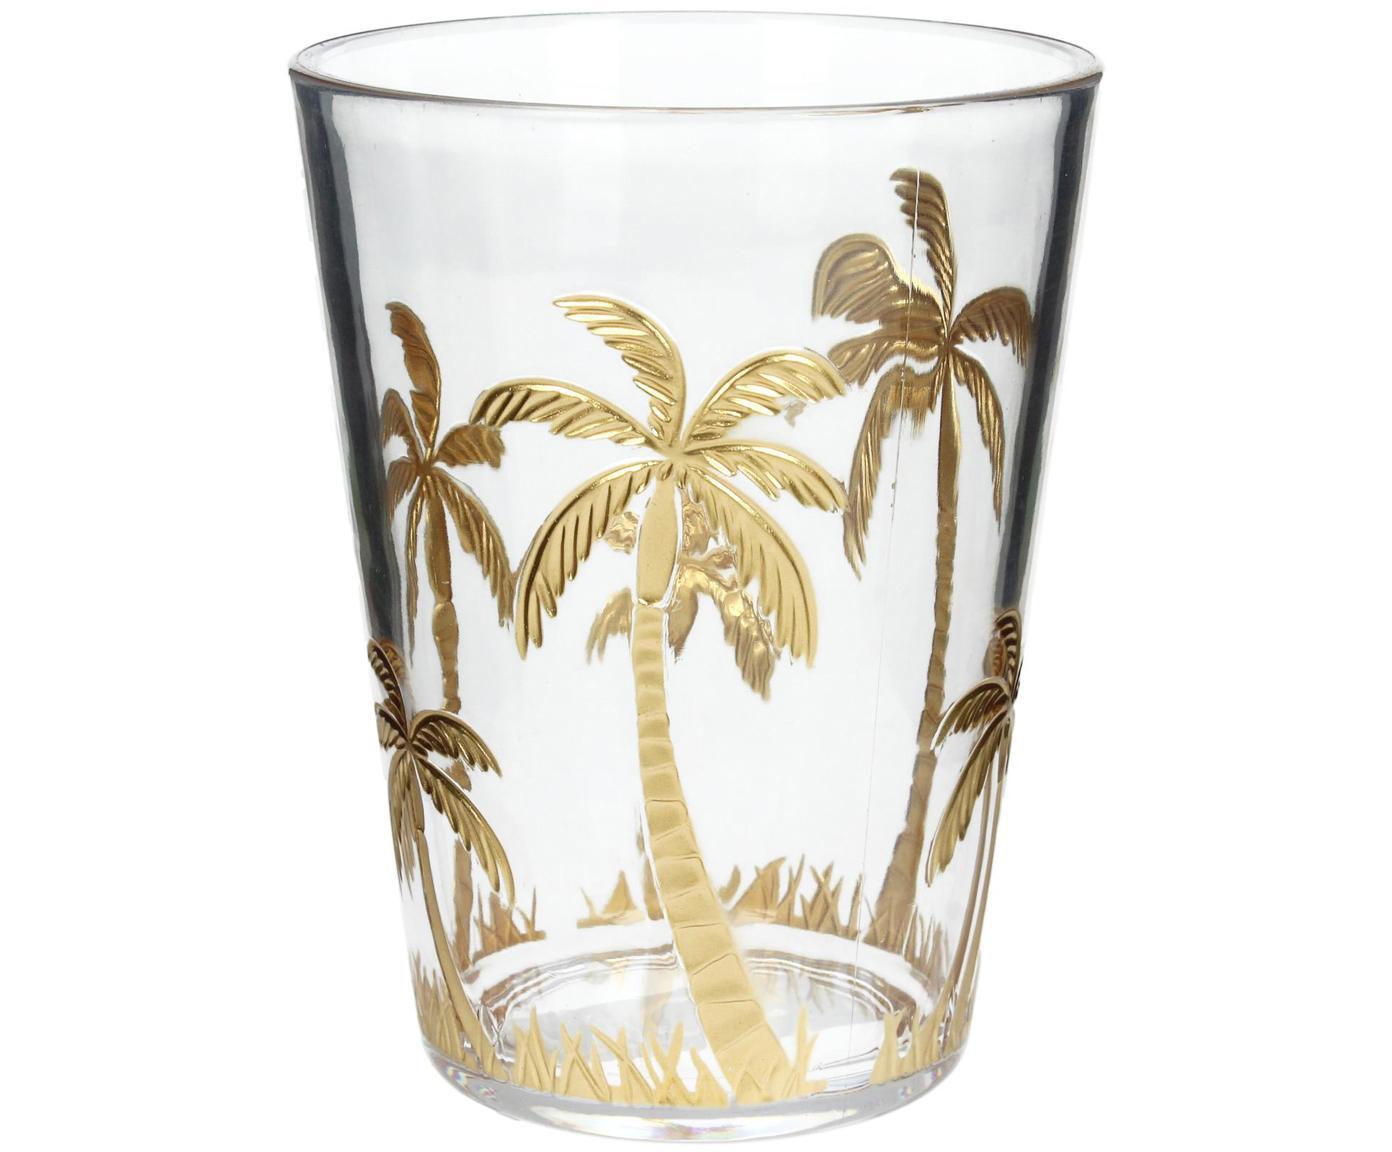 Acryl waterglas Kimberly, Acryl, Transparant, goudkleurig, Ø 9 x H 12 cm